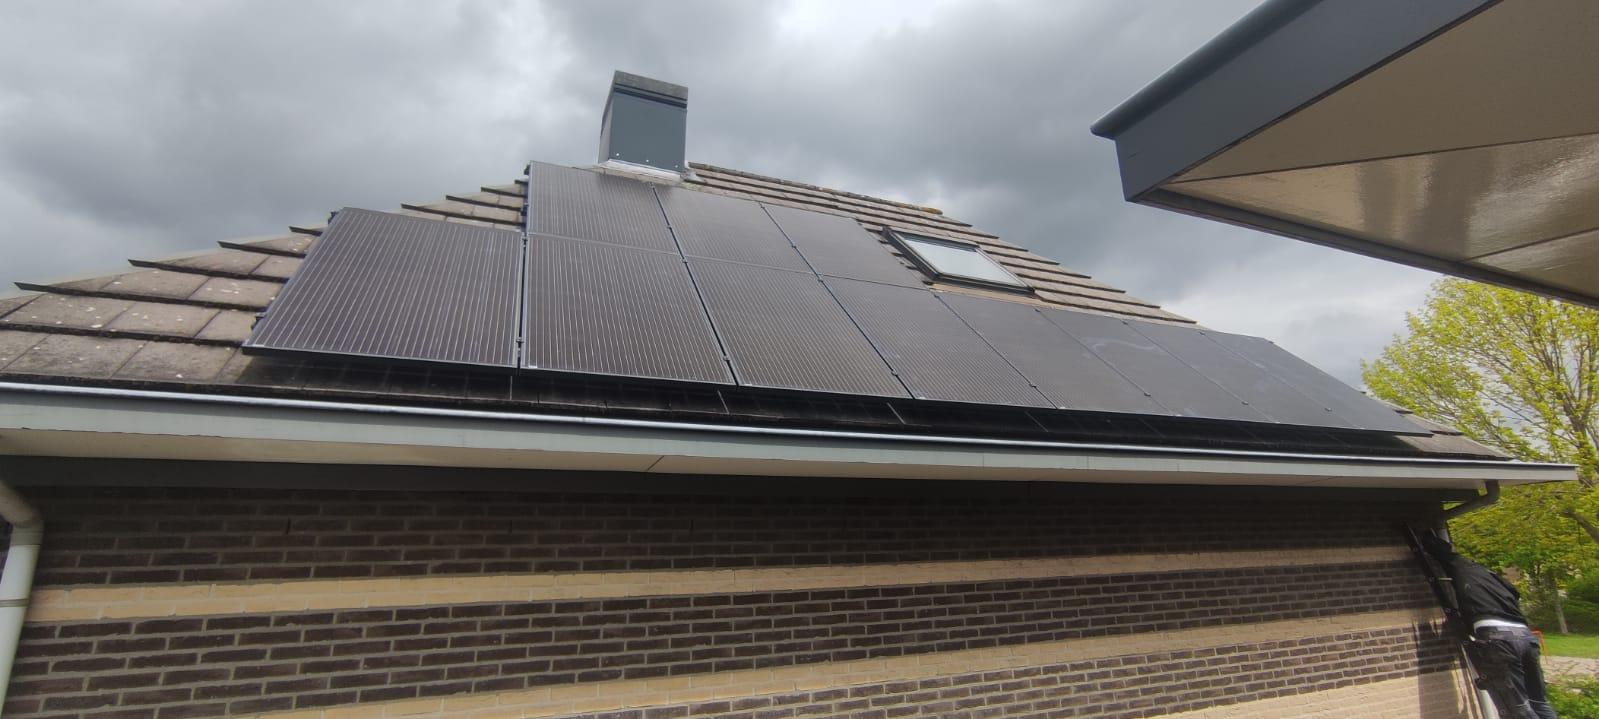 SolarWatt black edition glas/glas zonnepanelen HoogeveenDrenthe